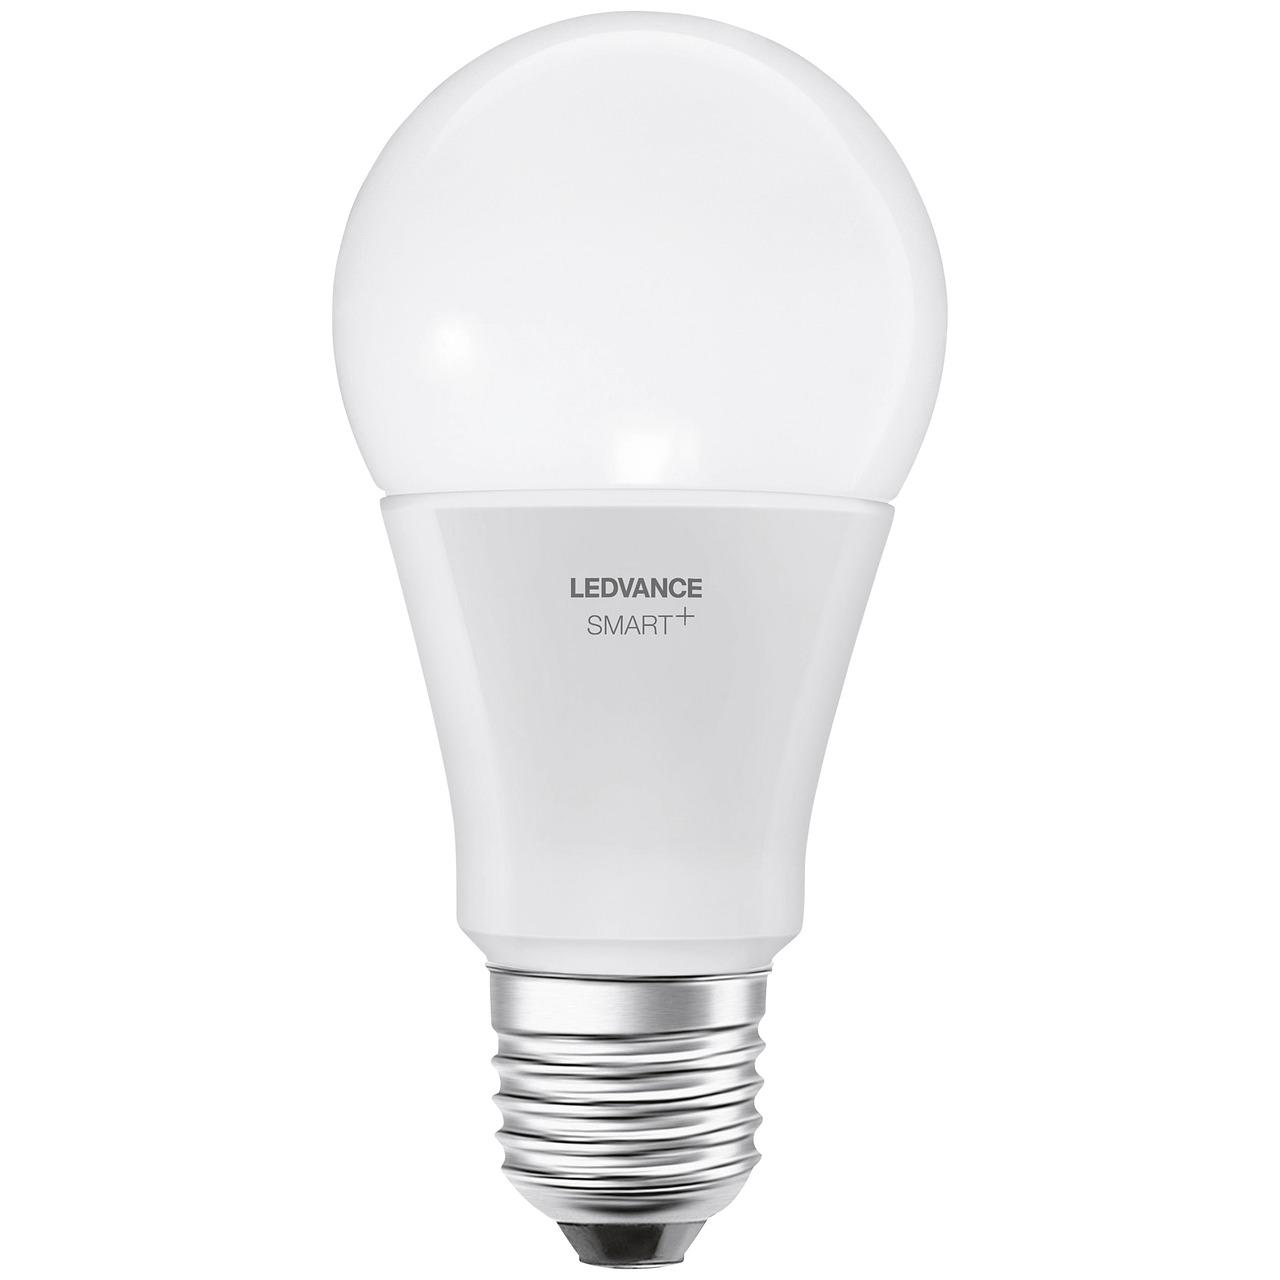 Ledvance SMART+ 8-5-W-LED-Lampe Tunable White- E27- ZigBee